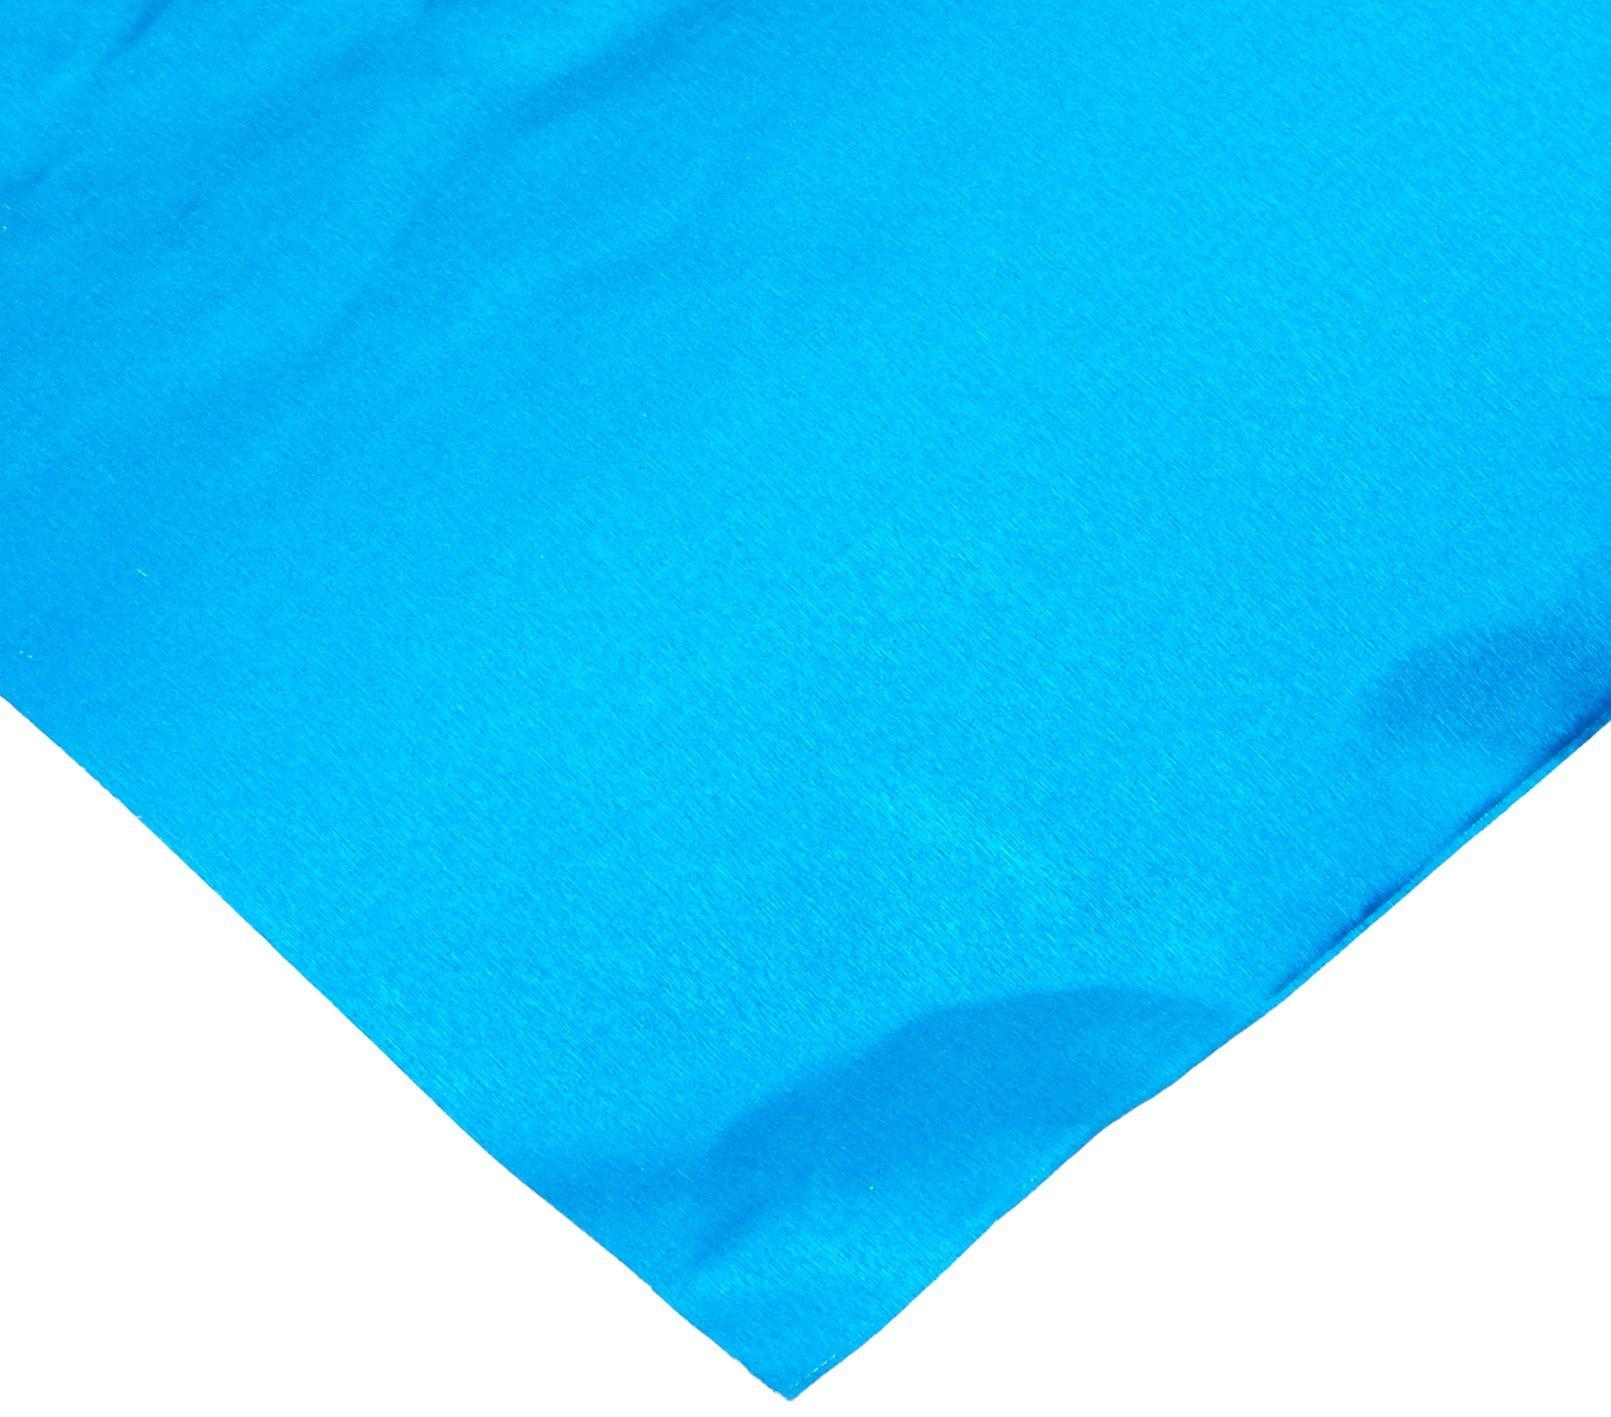 St. Louis Crafts 12''''X25' 38GA BLU Multi-Purpose Foil Roll, 12'' x 300'' Size, 38 Gauge, Aluminum, Bluetone by St. Louis Crafts